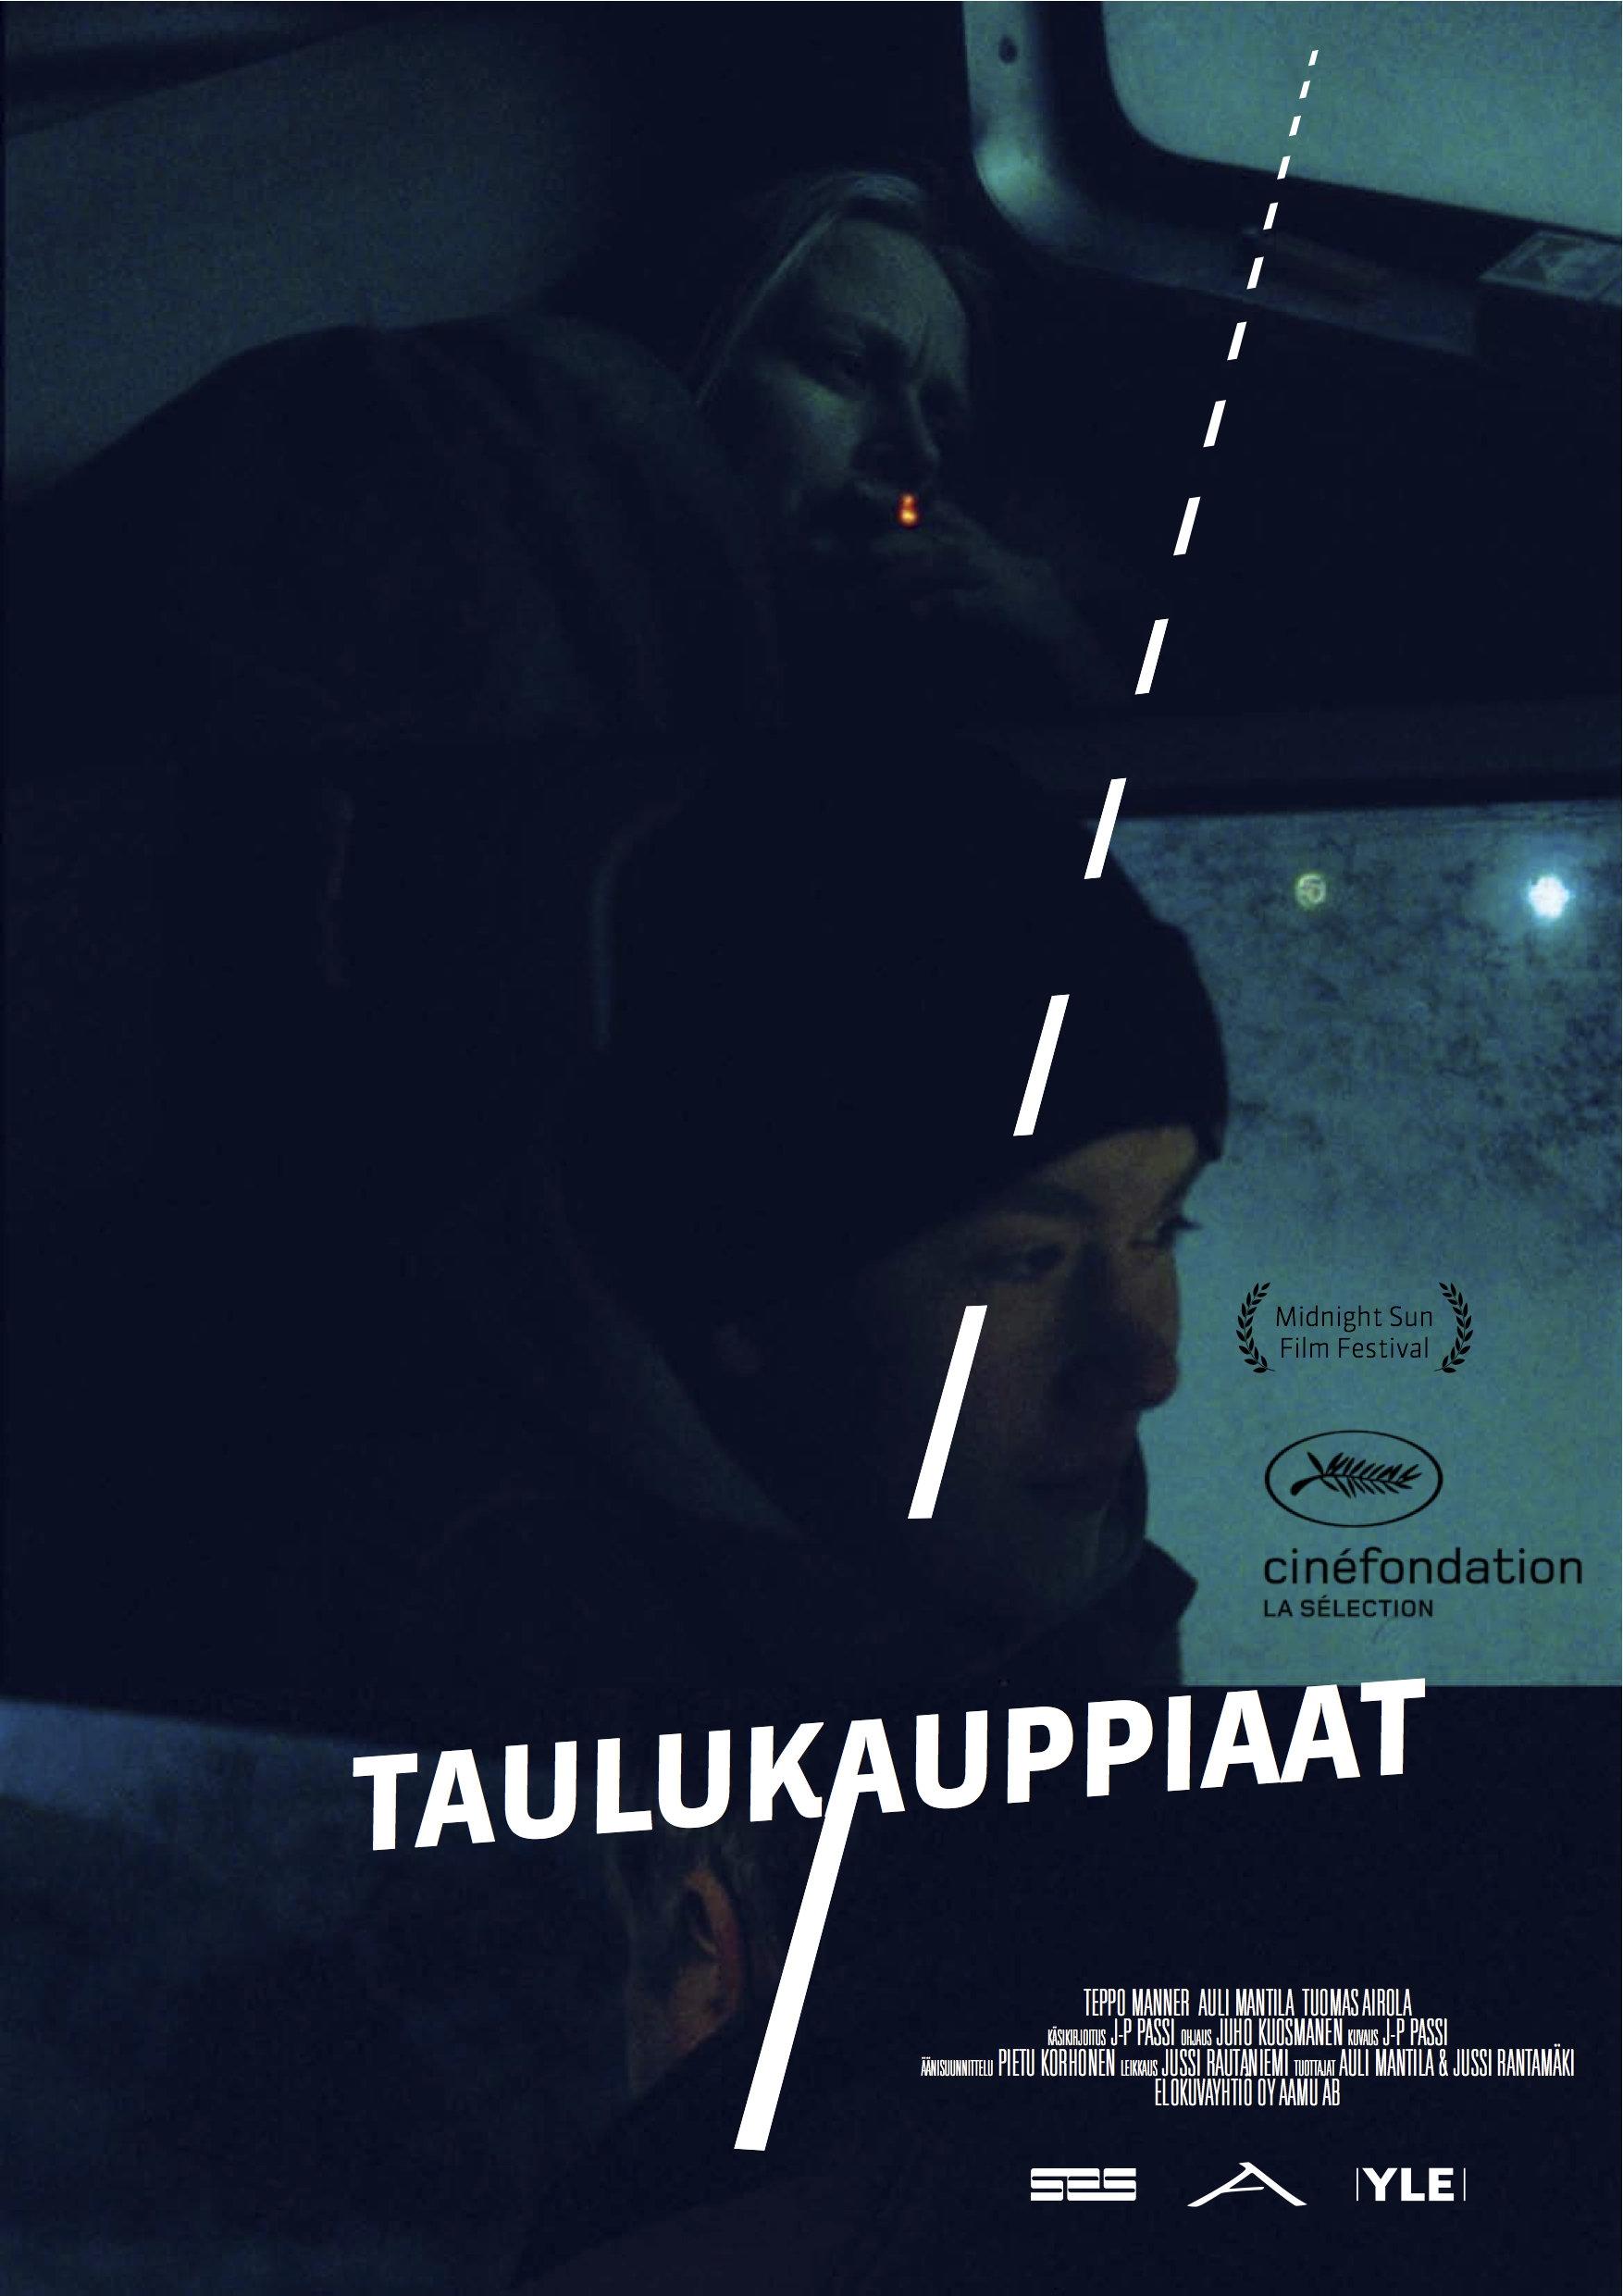 La locandina di Taulukauppiaat